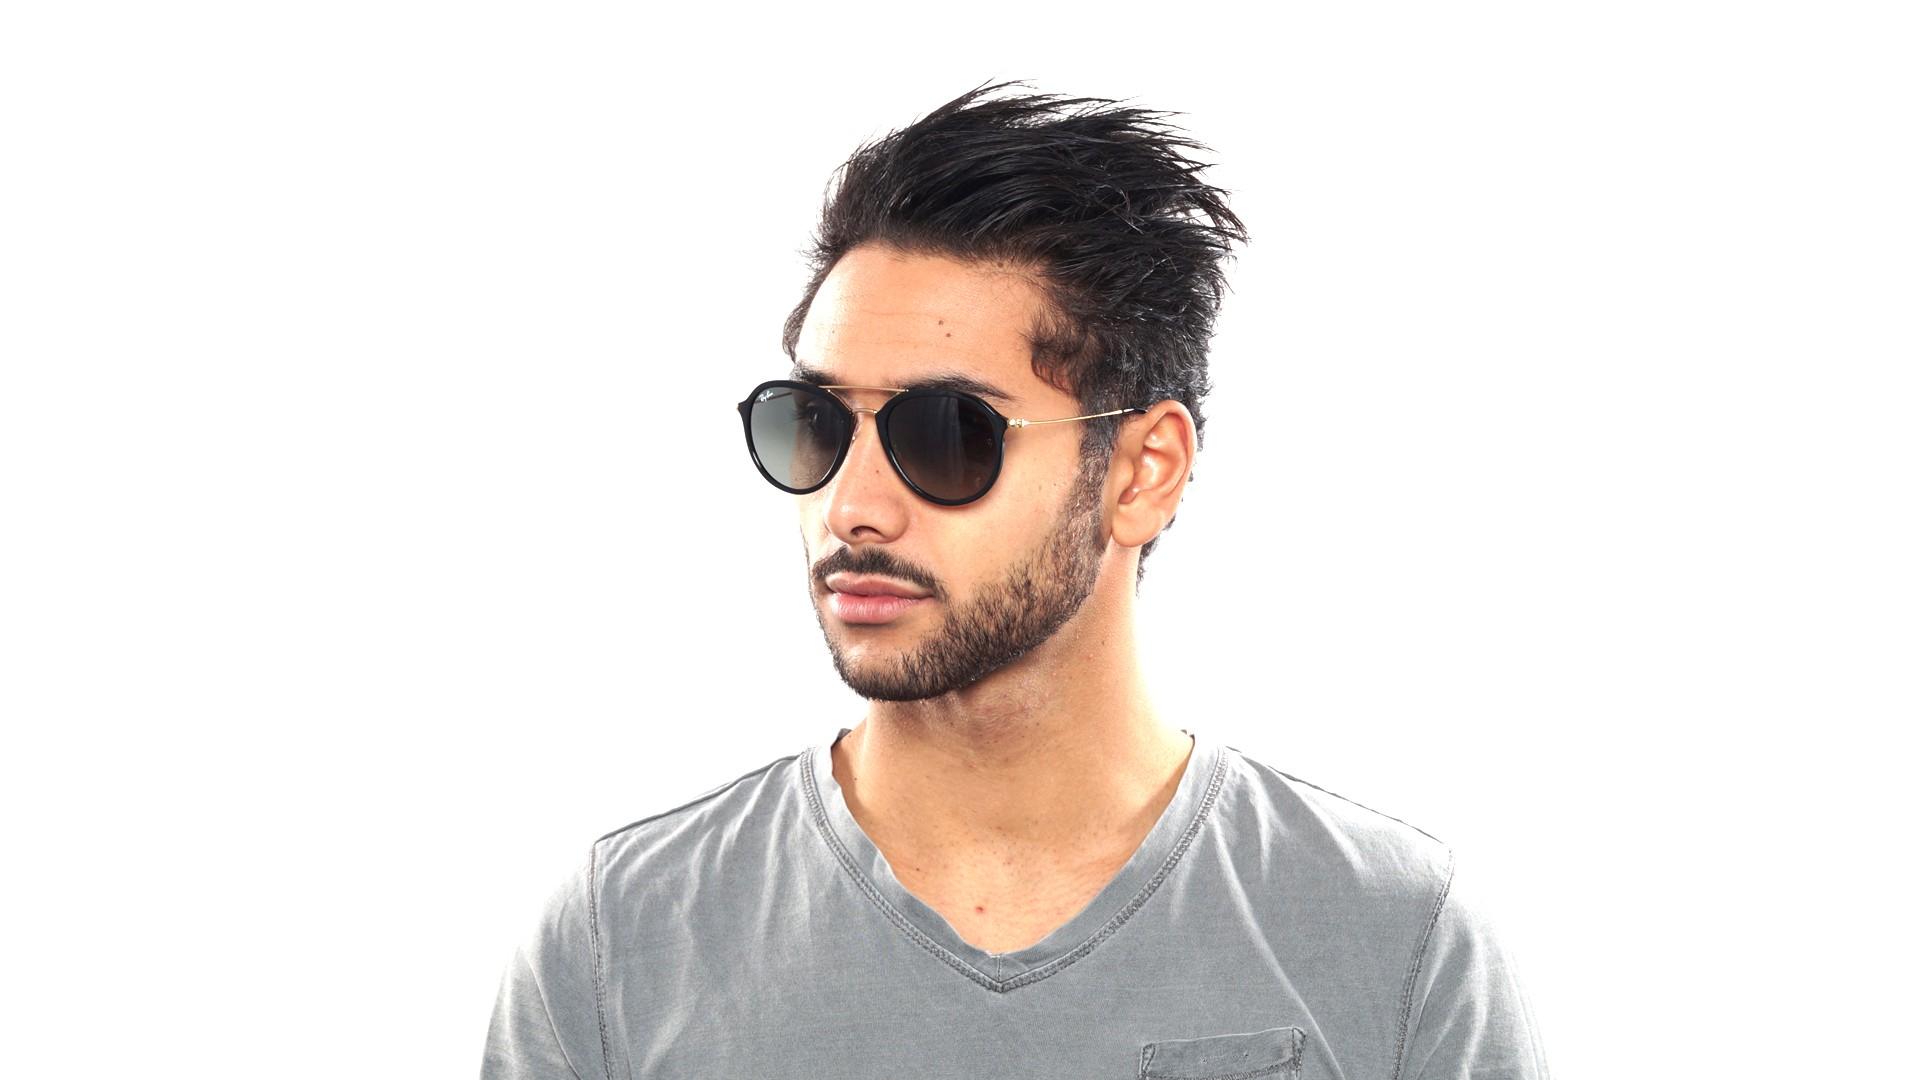 358182b7f4ab3 Sunglasses Ray-Ban RB4253 601 71 53-21 Black Medium Degraded